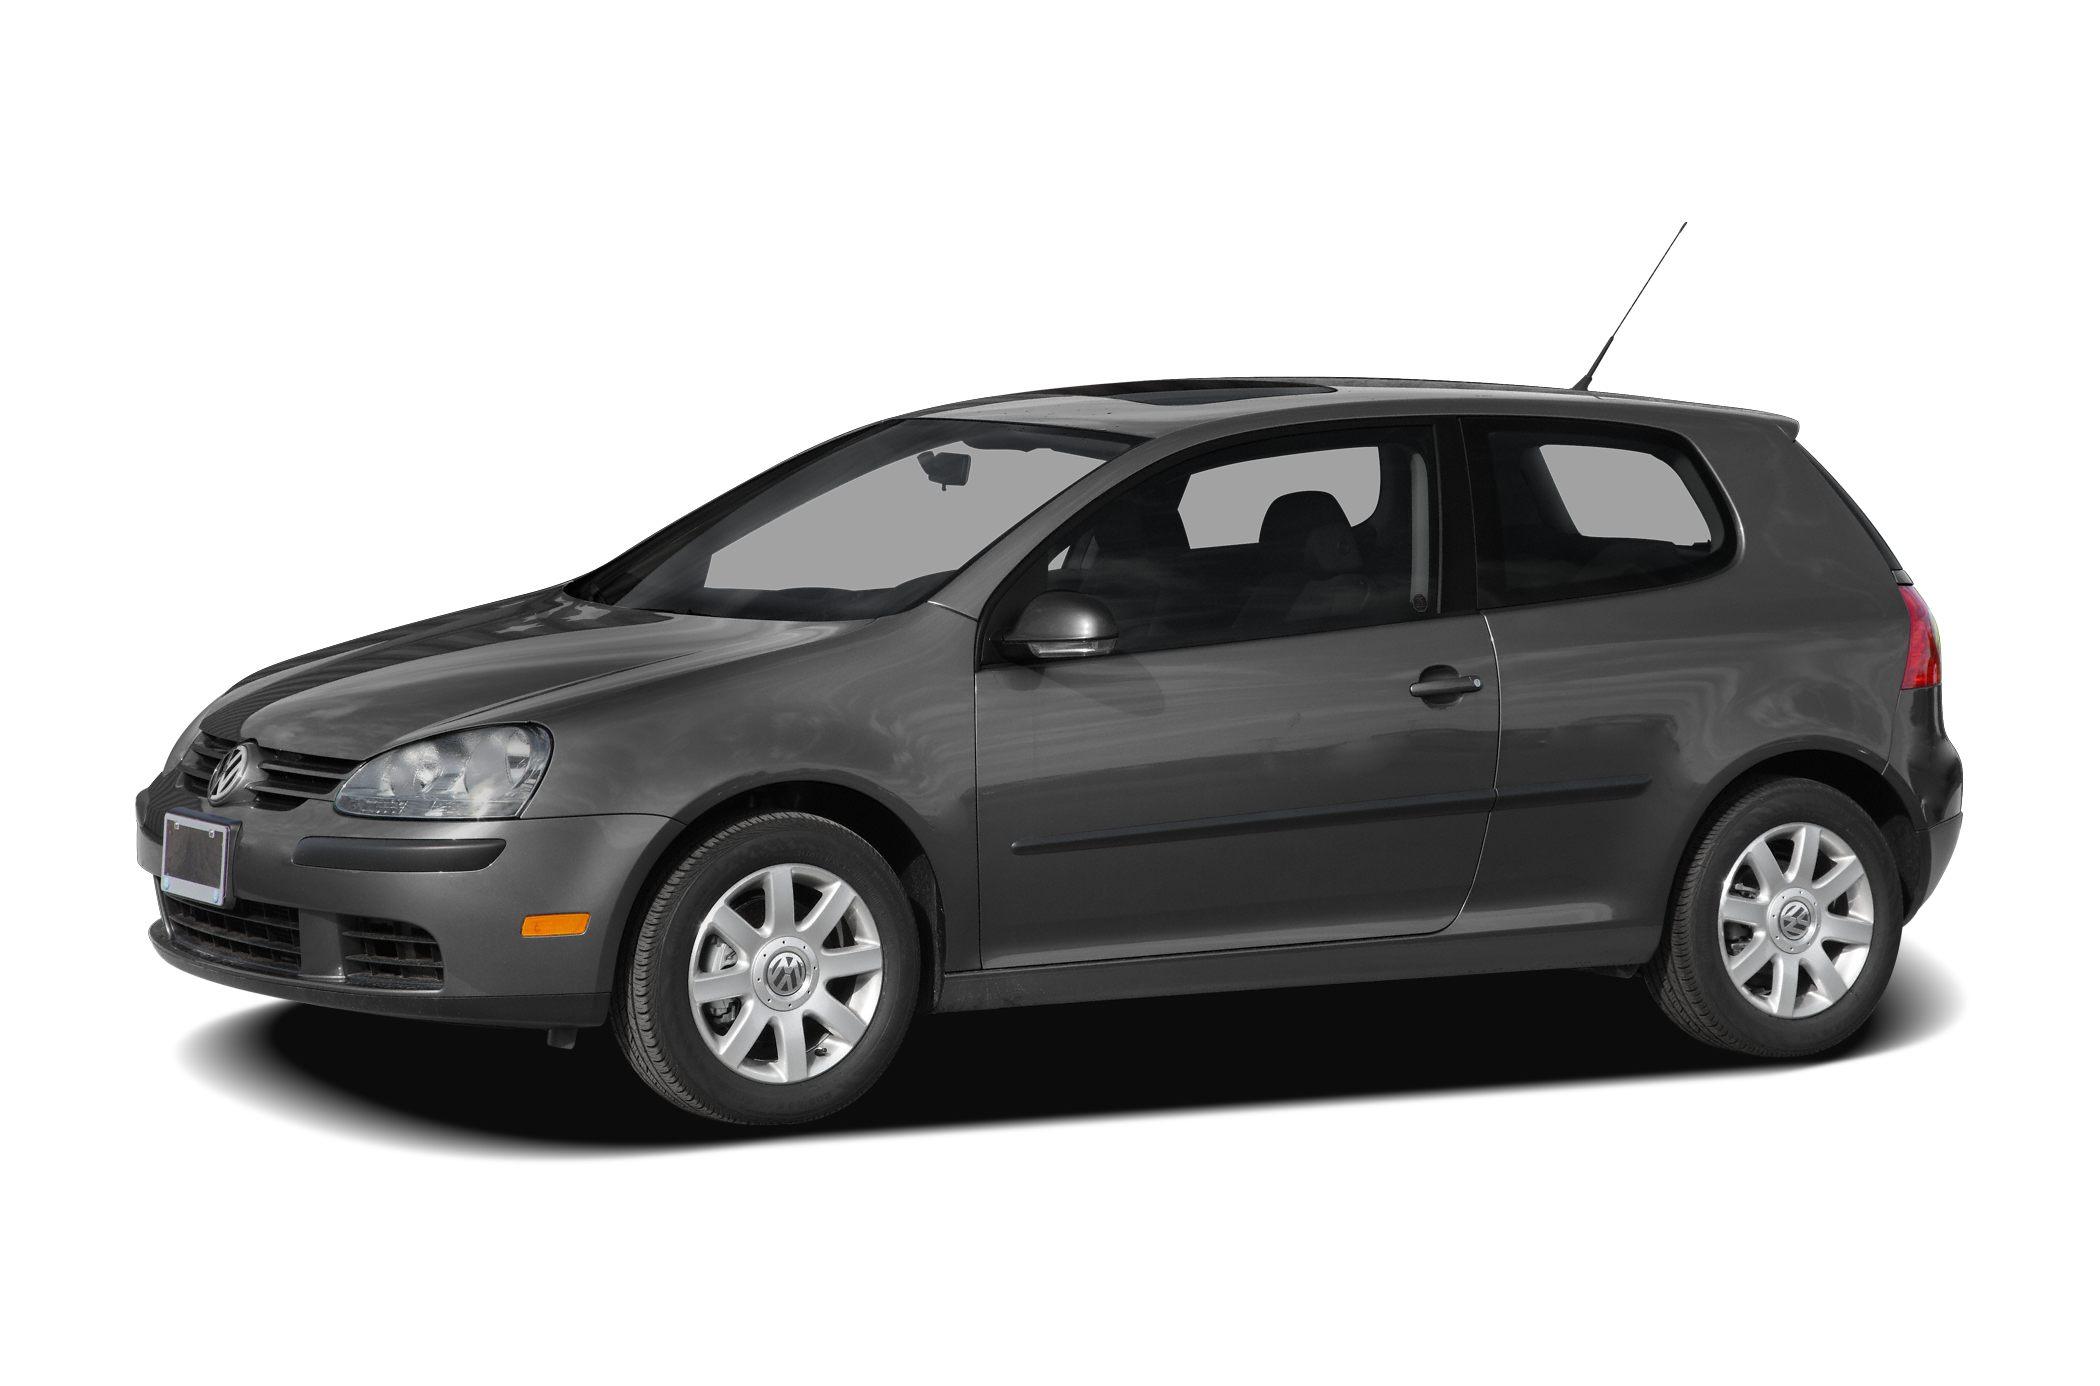 2008 Volkswagen Rabbit S Hatchback for sale in Louisville for $10,000 with 43,193 miles.